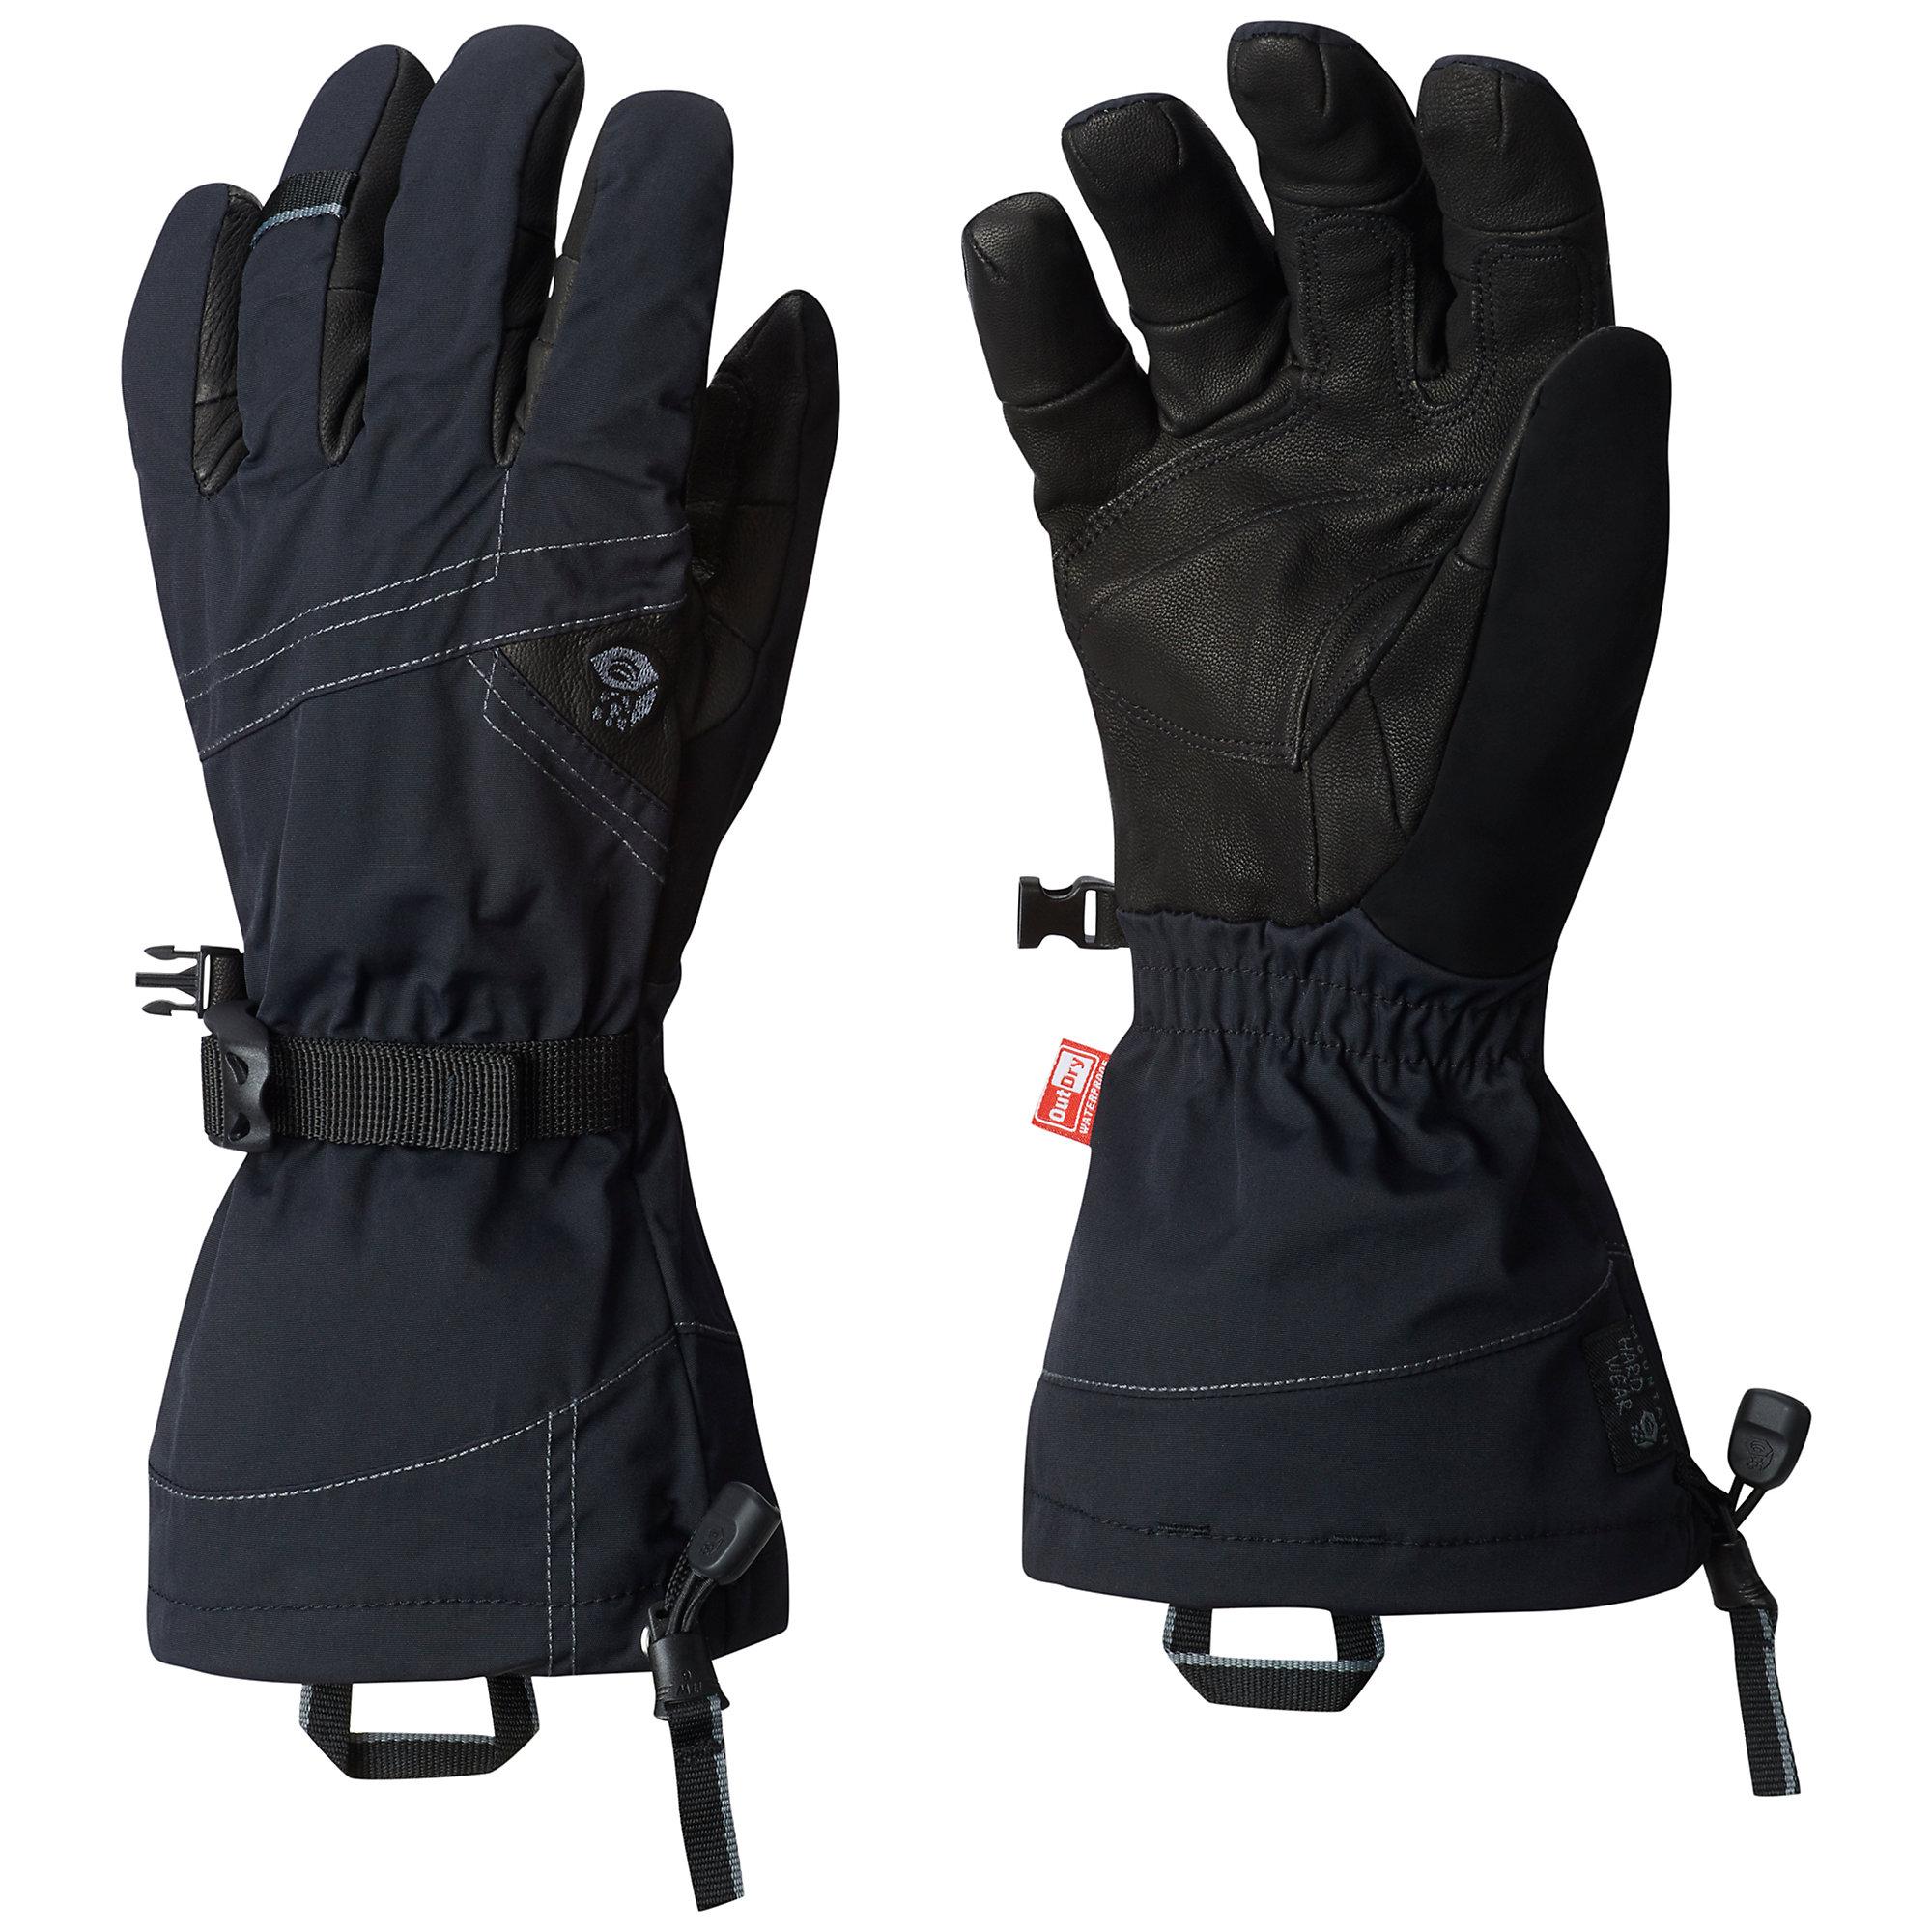 Mountain Hardwear Typhon OutDry EXT II Glove